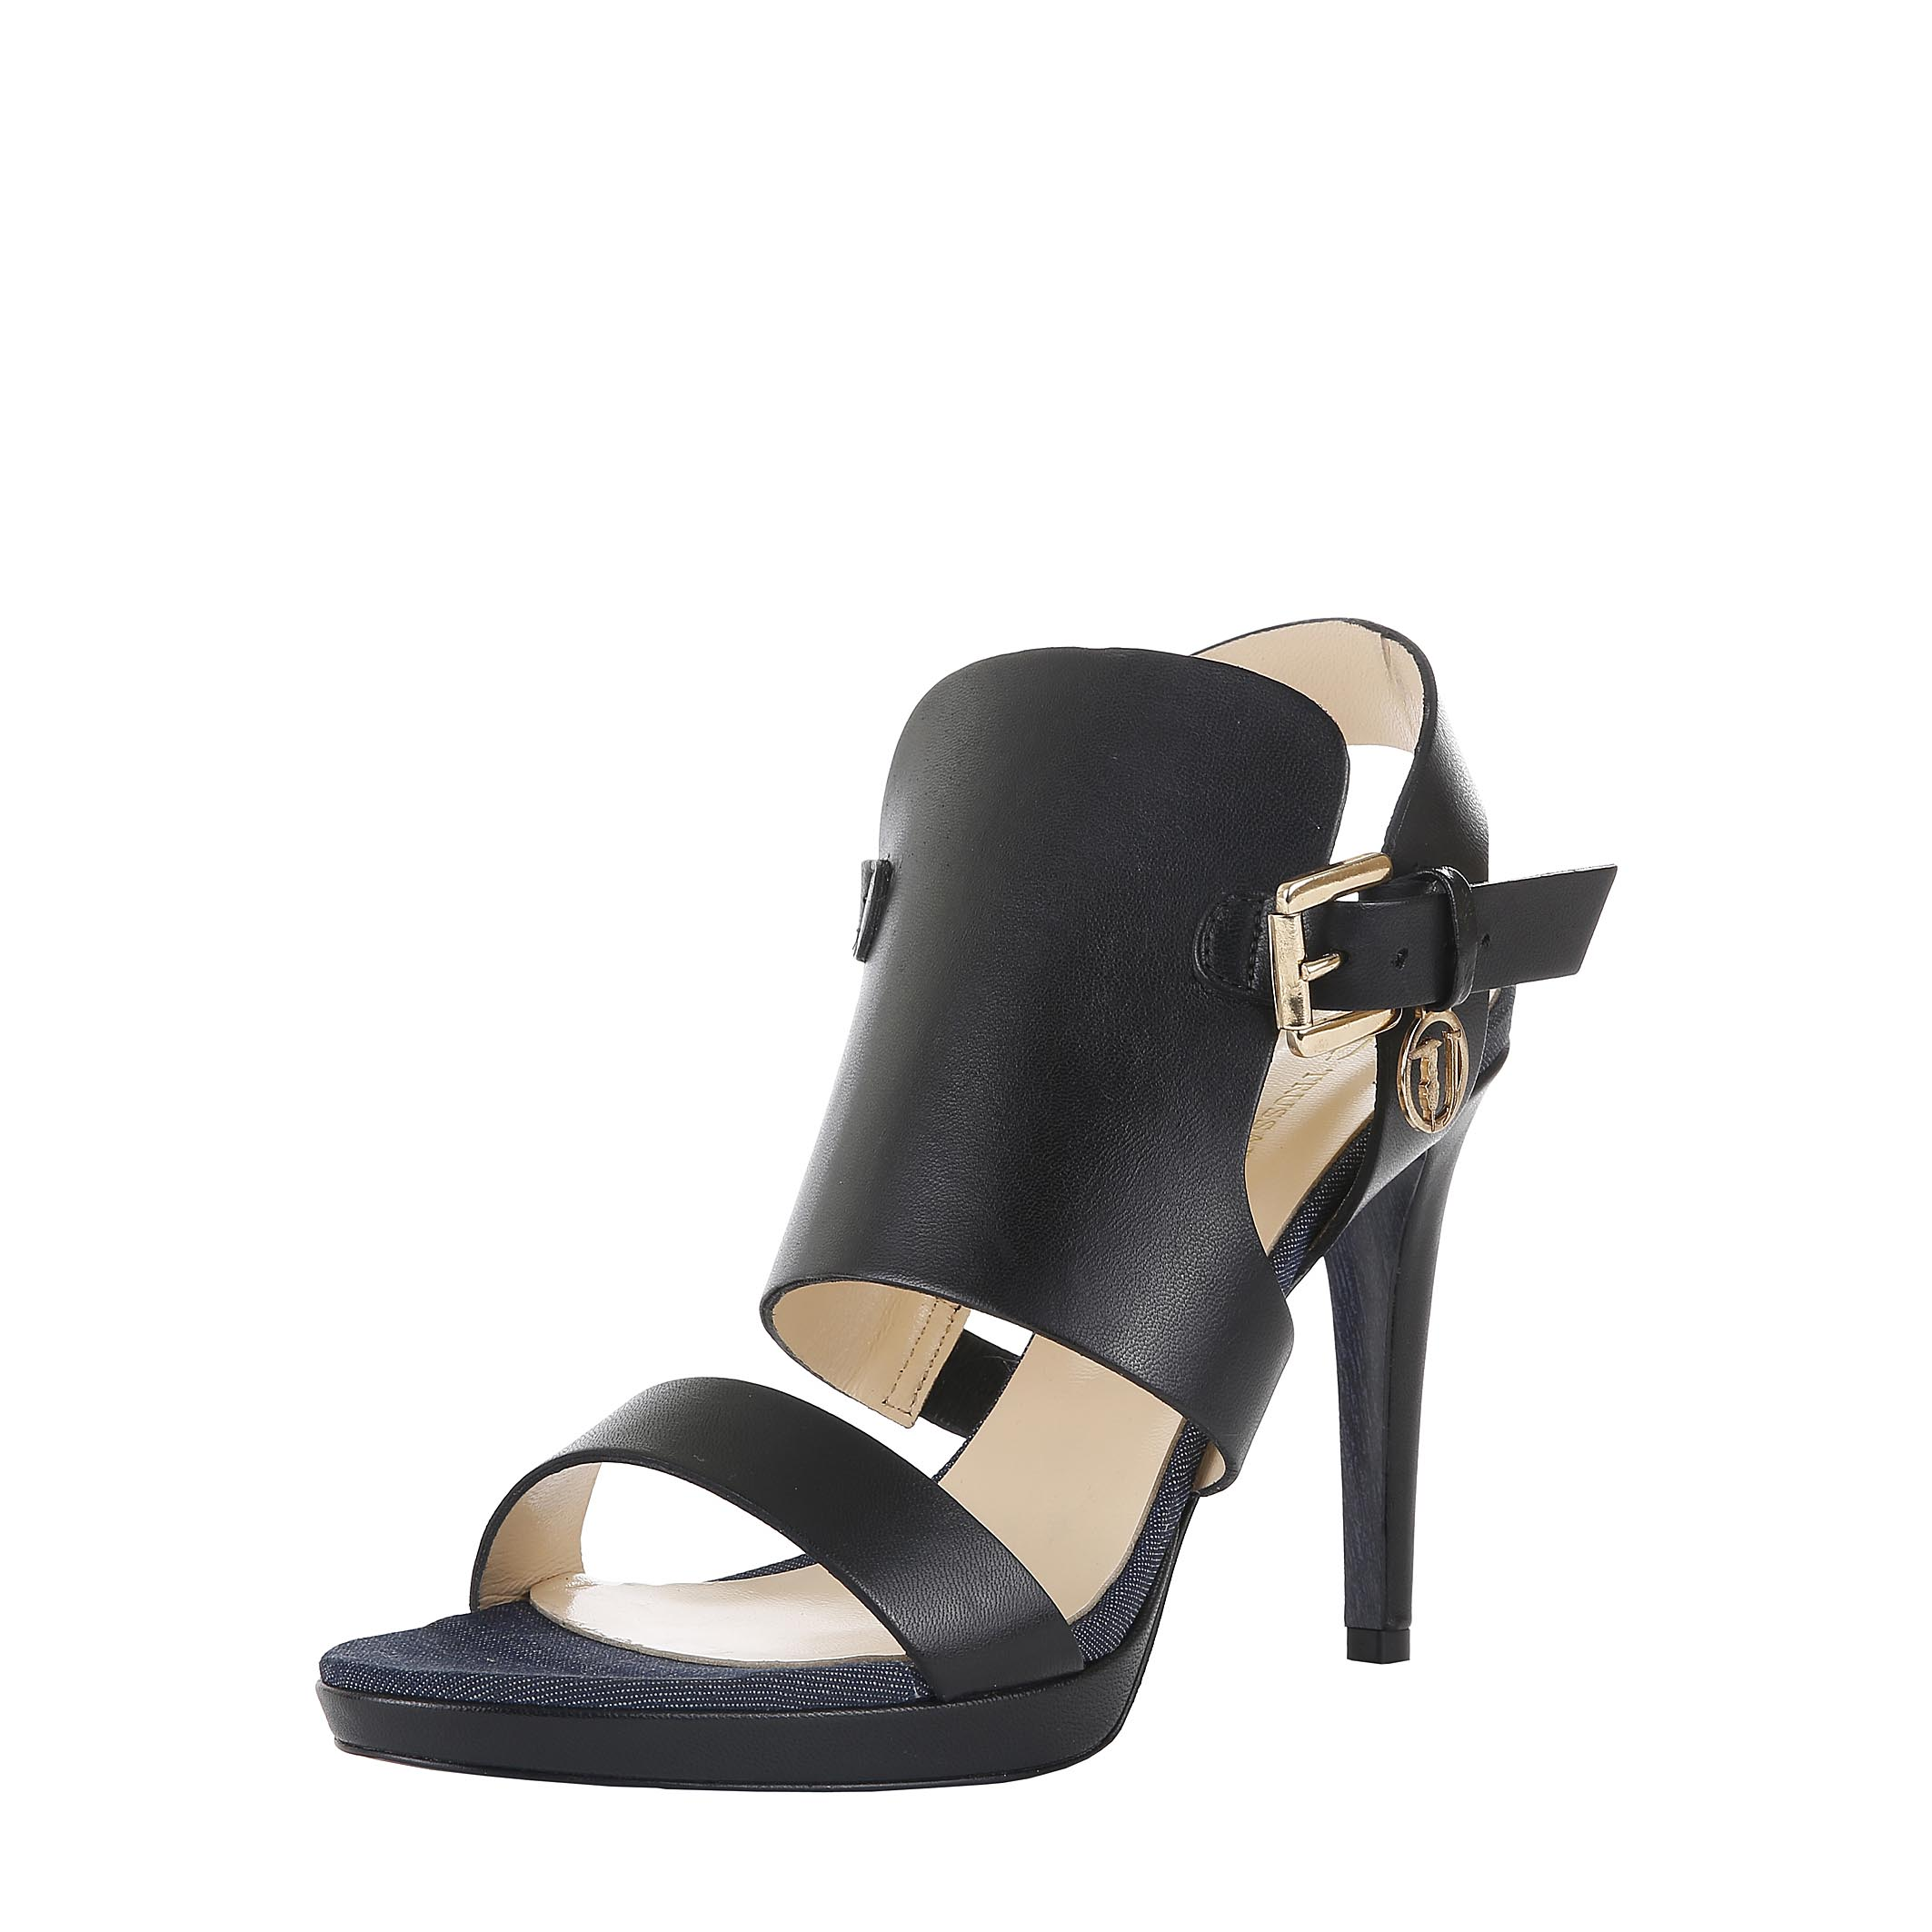 Chaussures  Trussardi 79S002 black